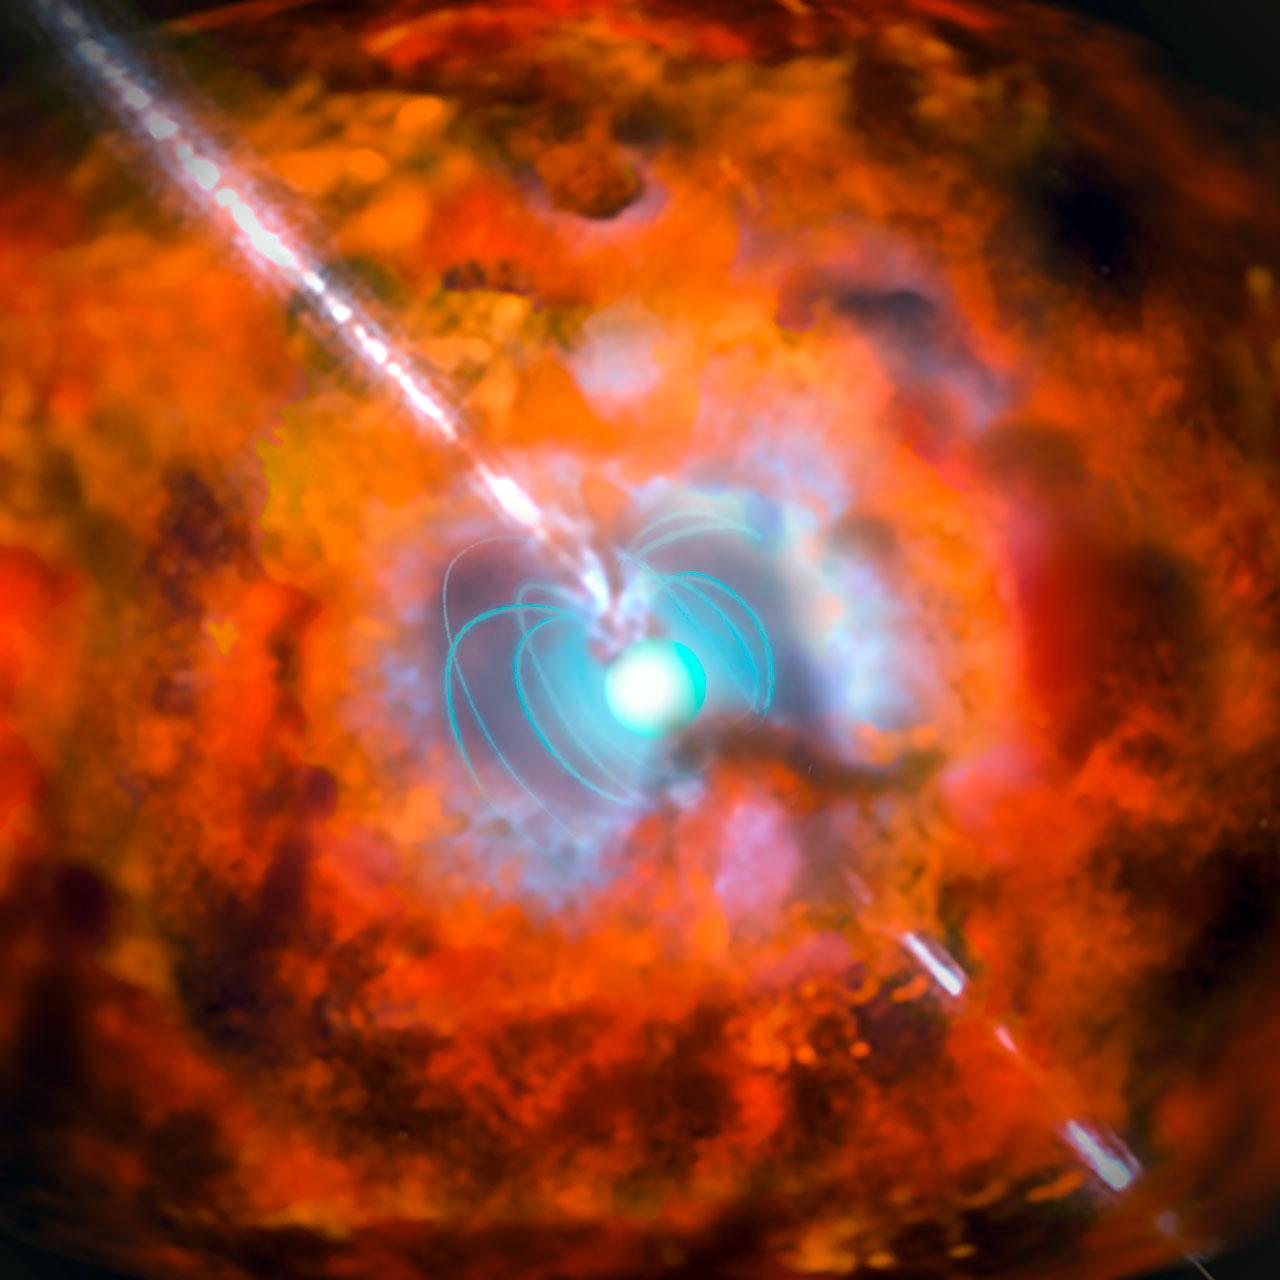 Artist's impression of a gamma-ray burst and supernova powered